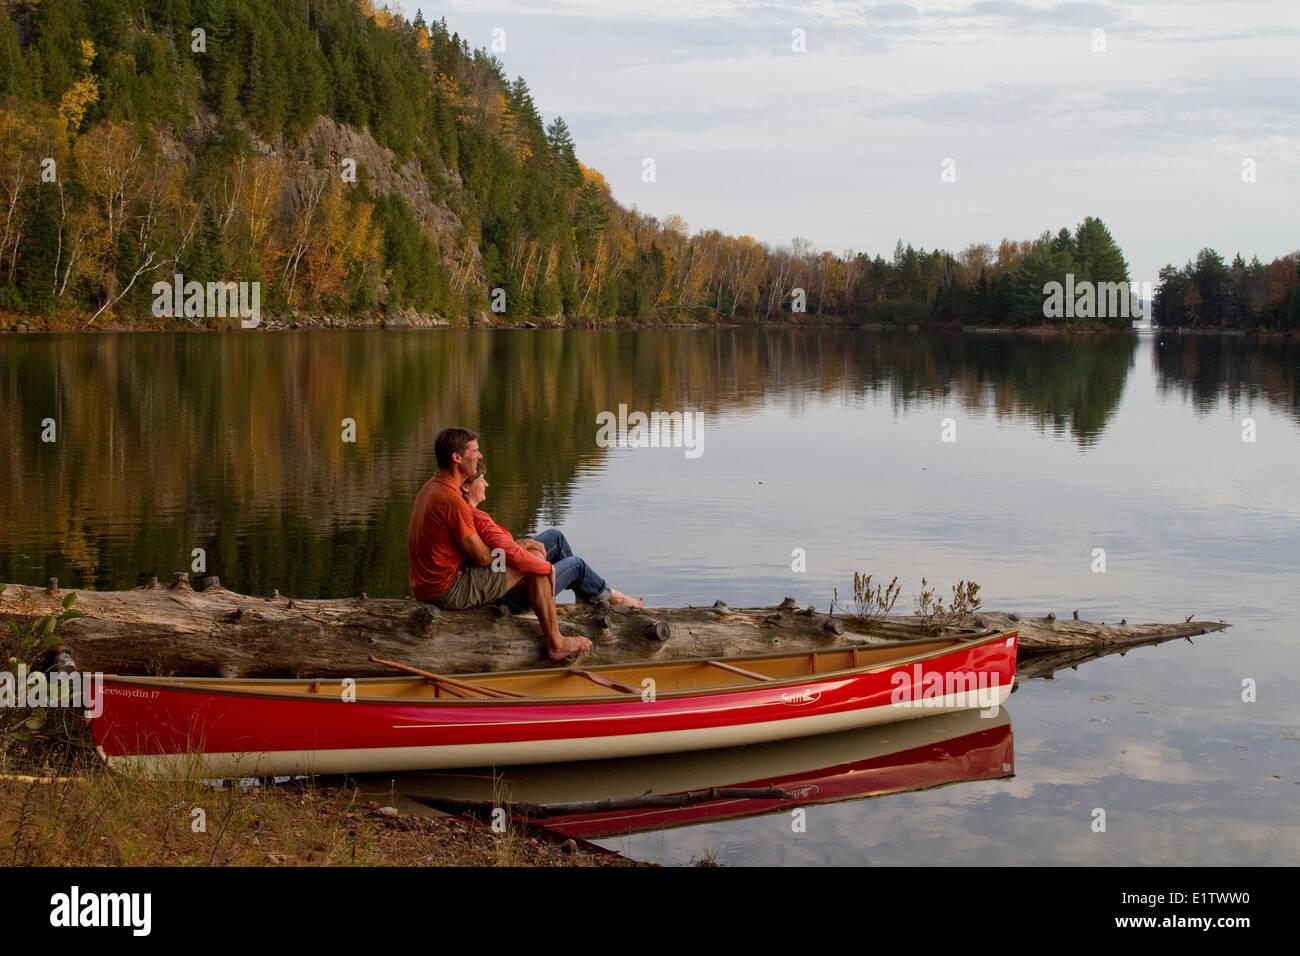 Young couple enjoy quite evening beside canoe on Oxtongue Lake, Muskoka, Ontario, Canada. - Stock Image